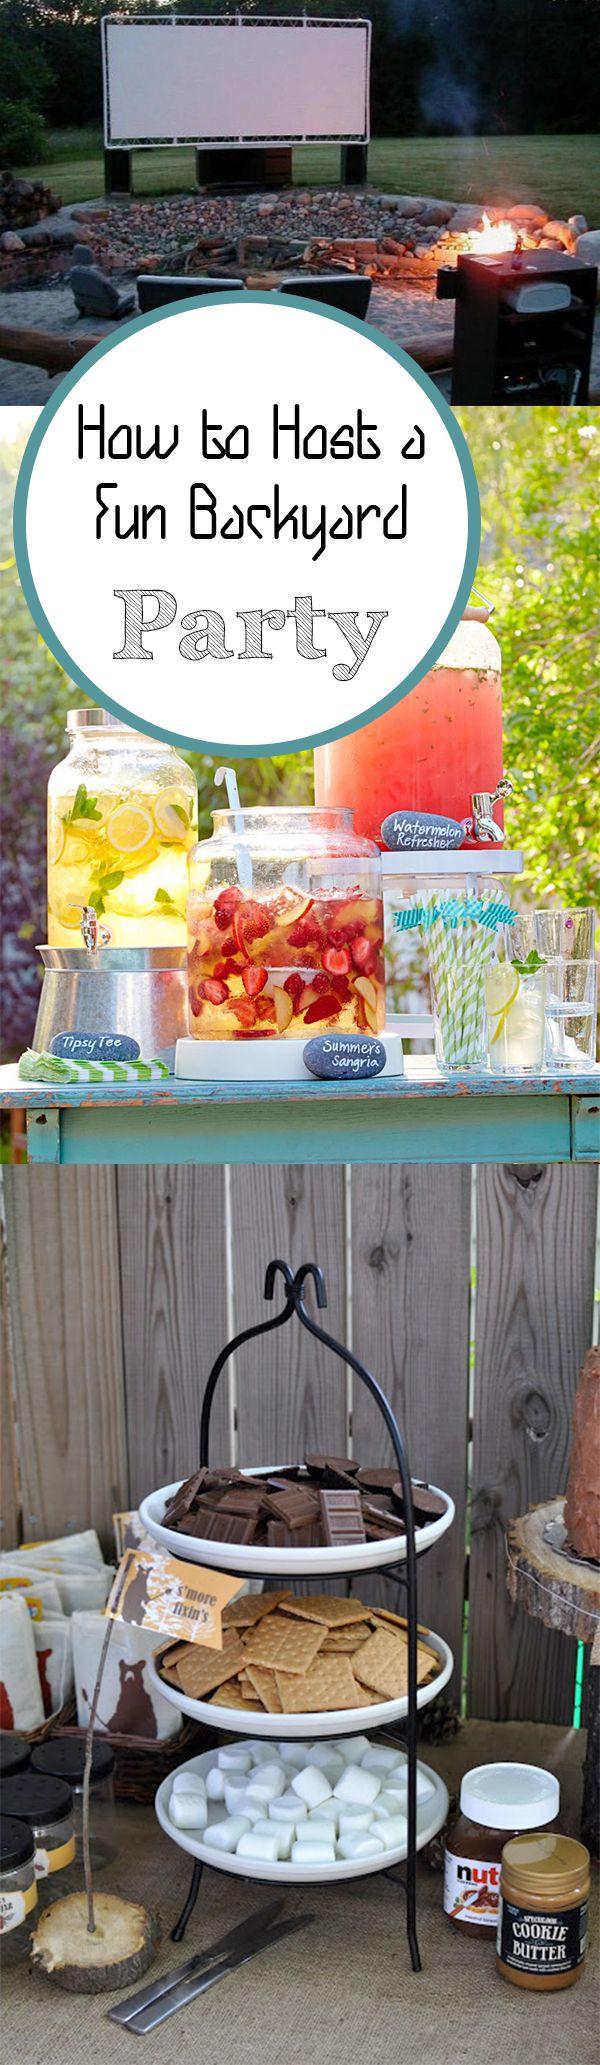 Ideas For Backyard Party  Backyard Parties on Pinterest